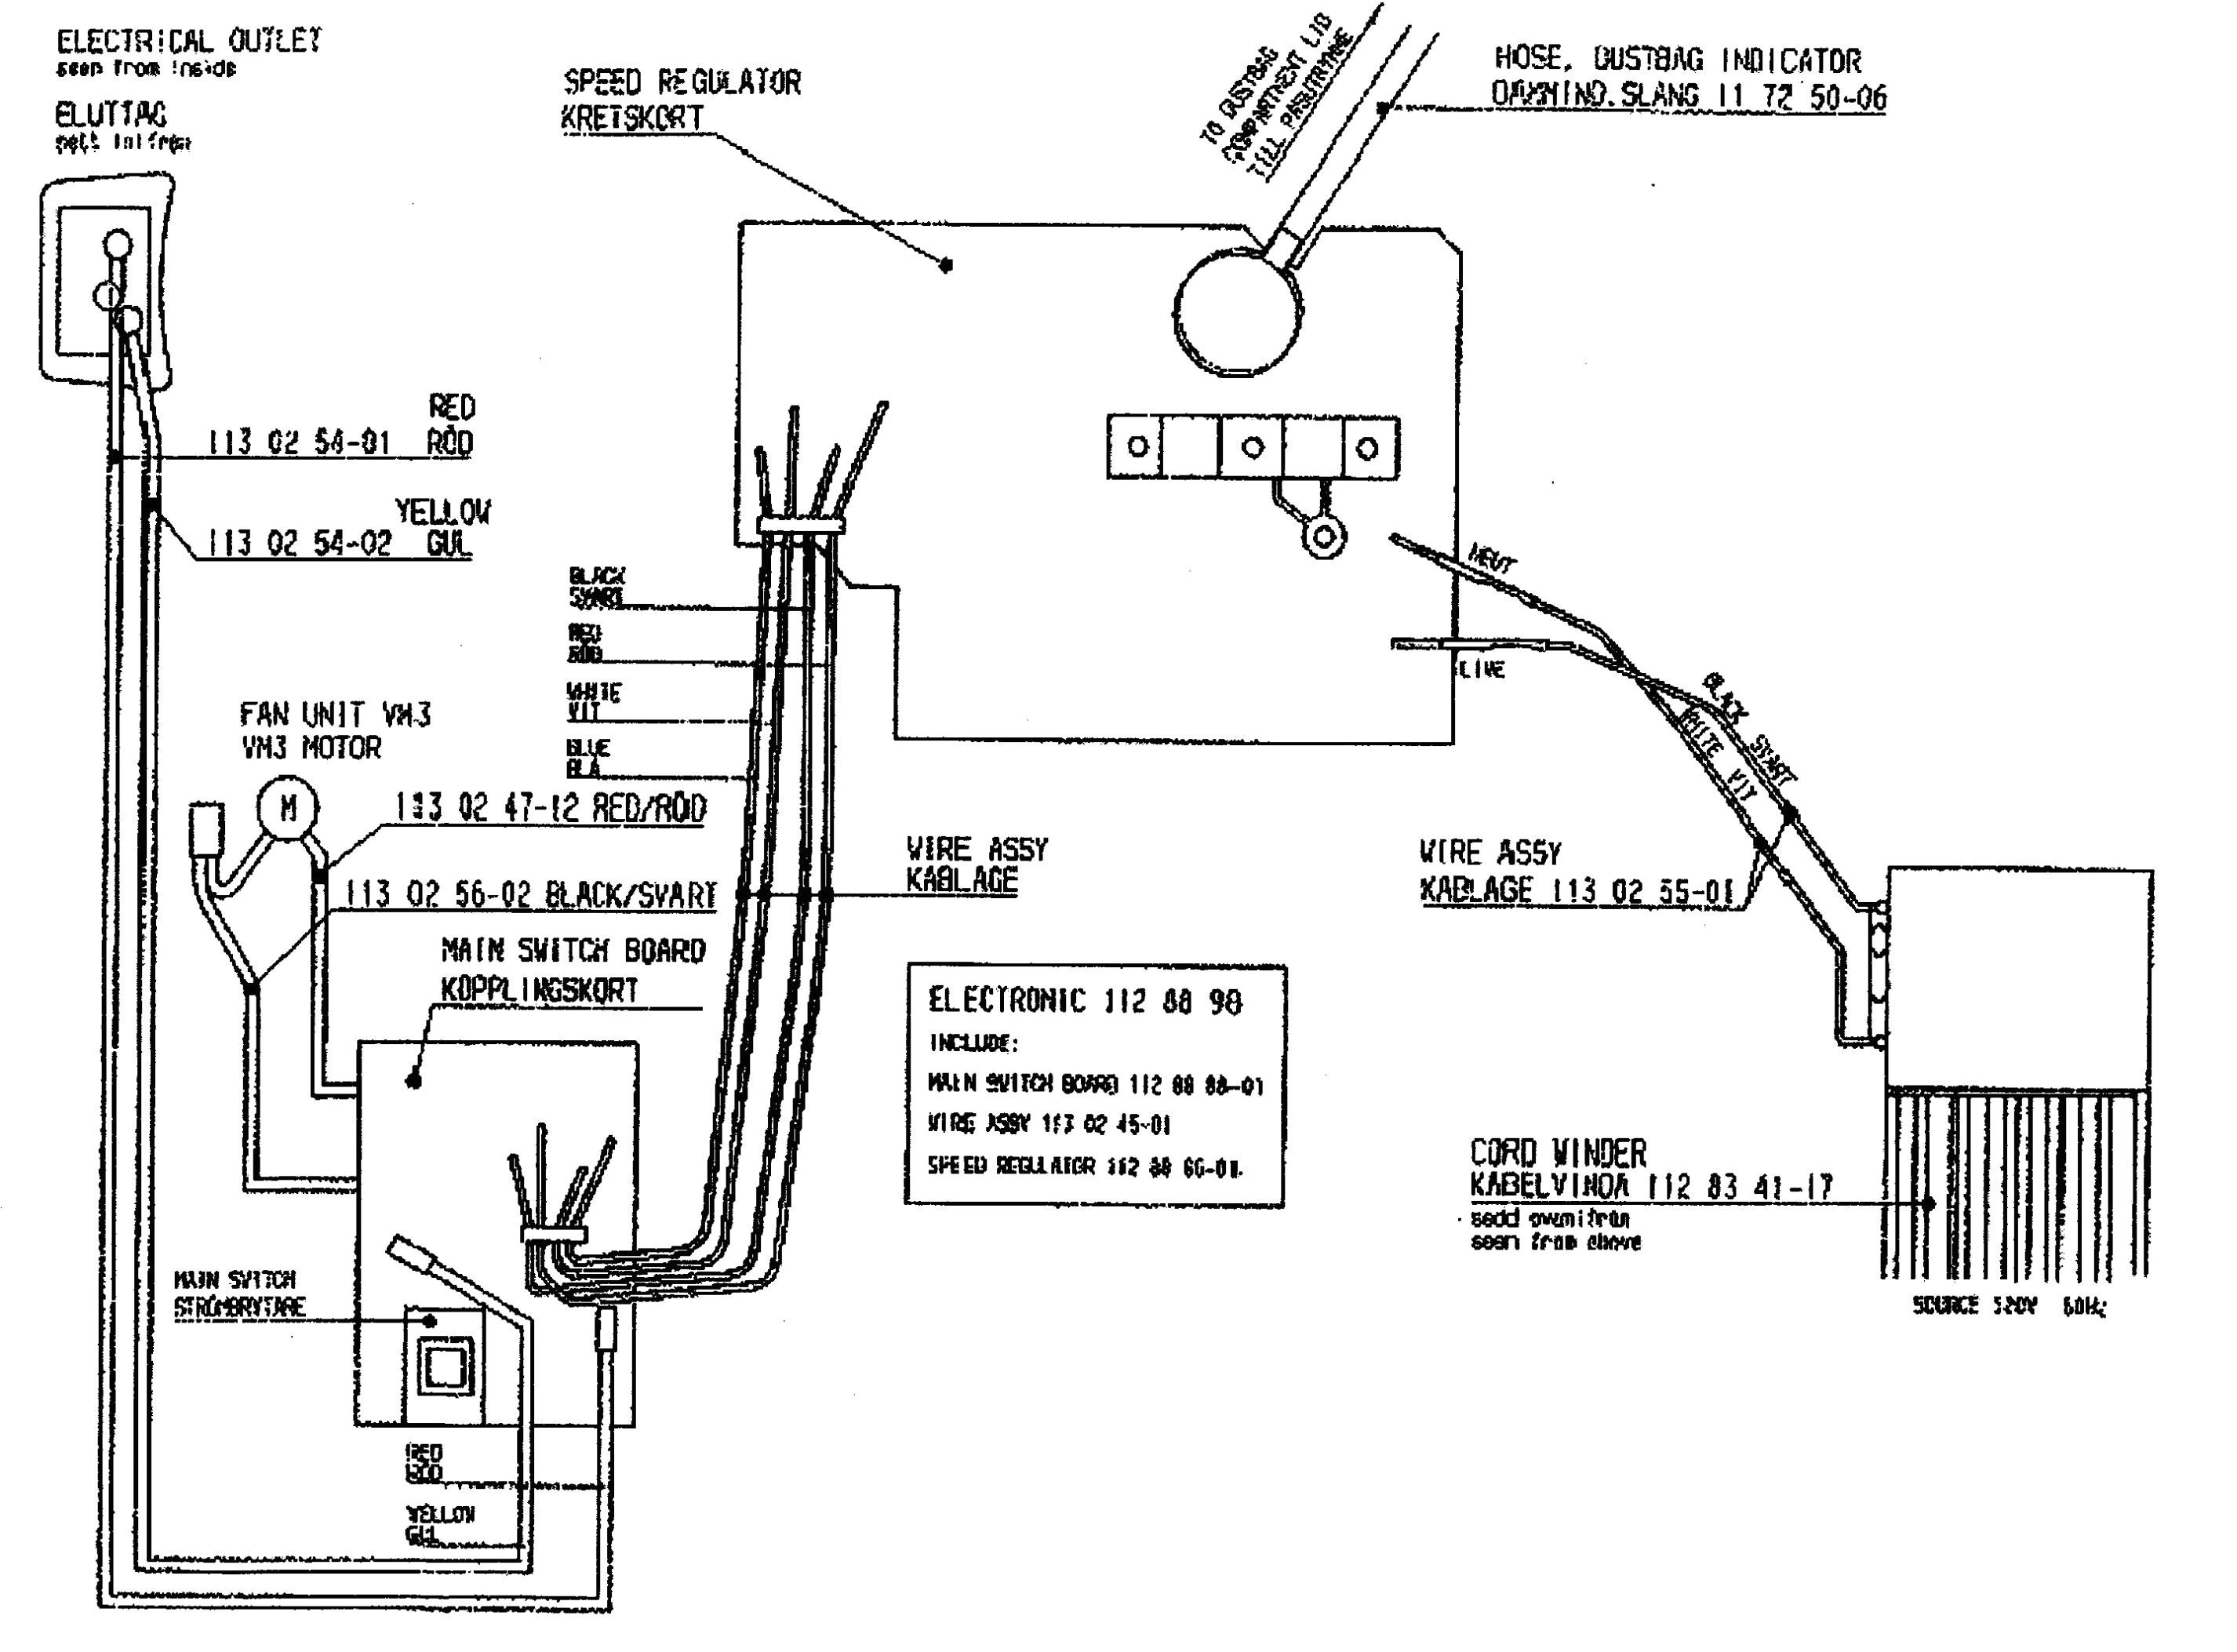 carpet cleaner wiring diagram wiring diagram view electrolux vacuum wiring diagrams wiring diagram database carpet cleaner